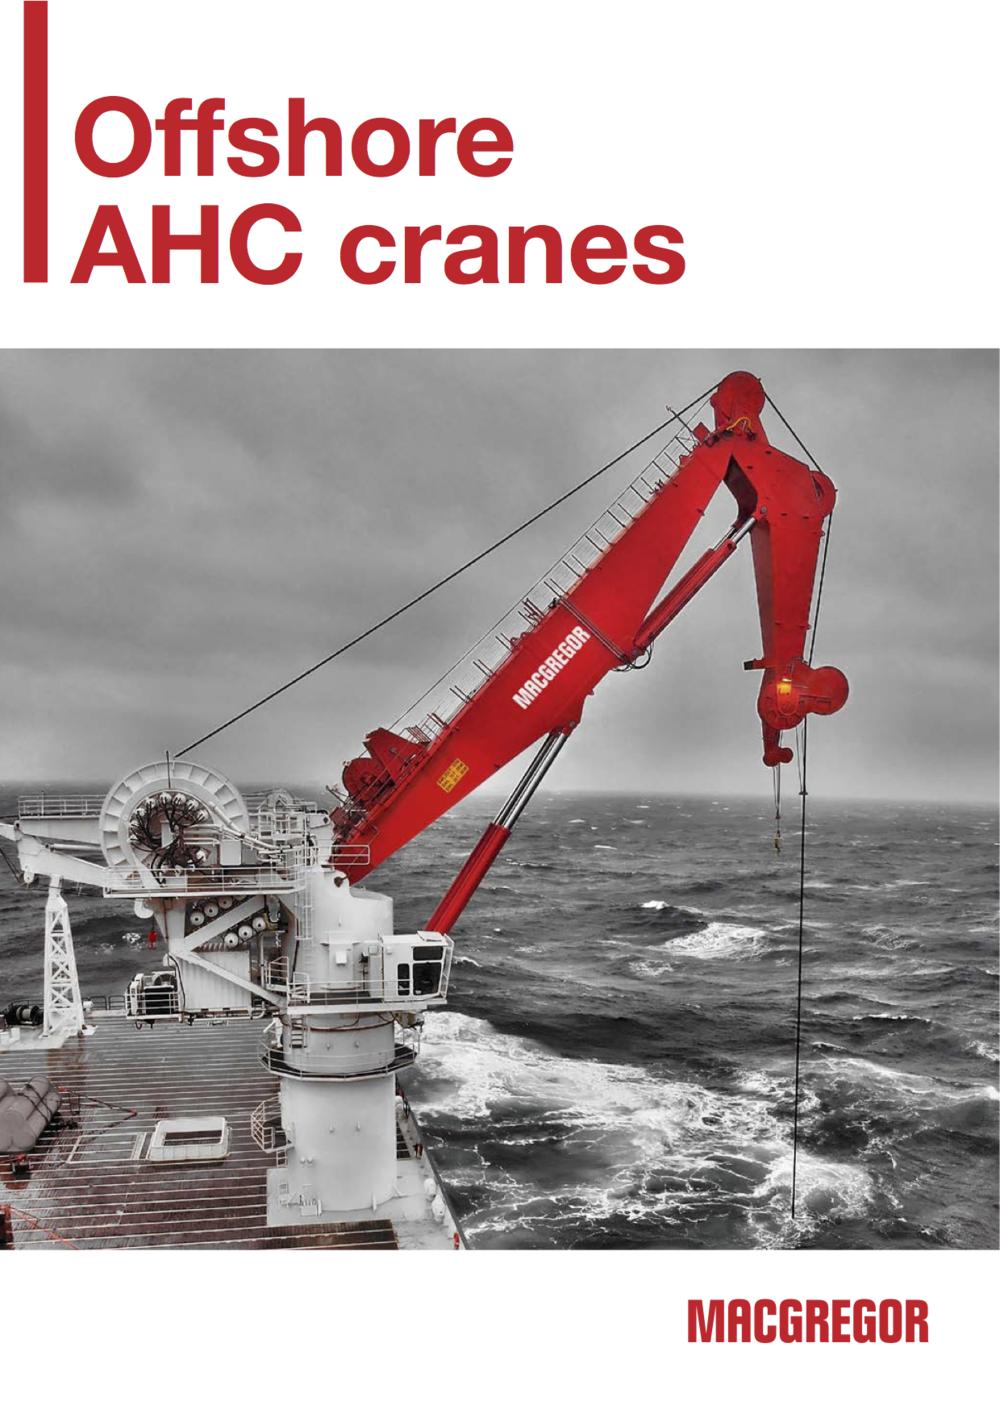 MacGregor_AHC Offshore Cranes-Cover.png